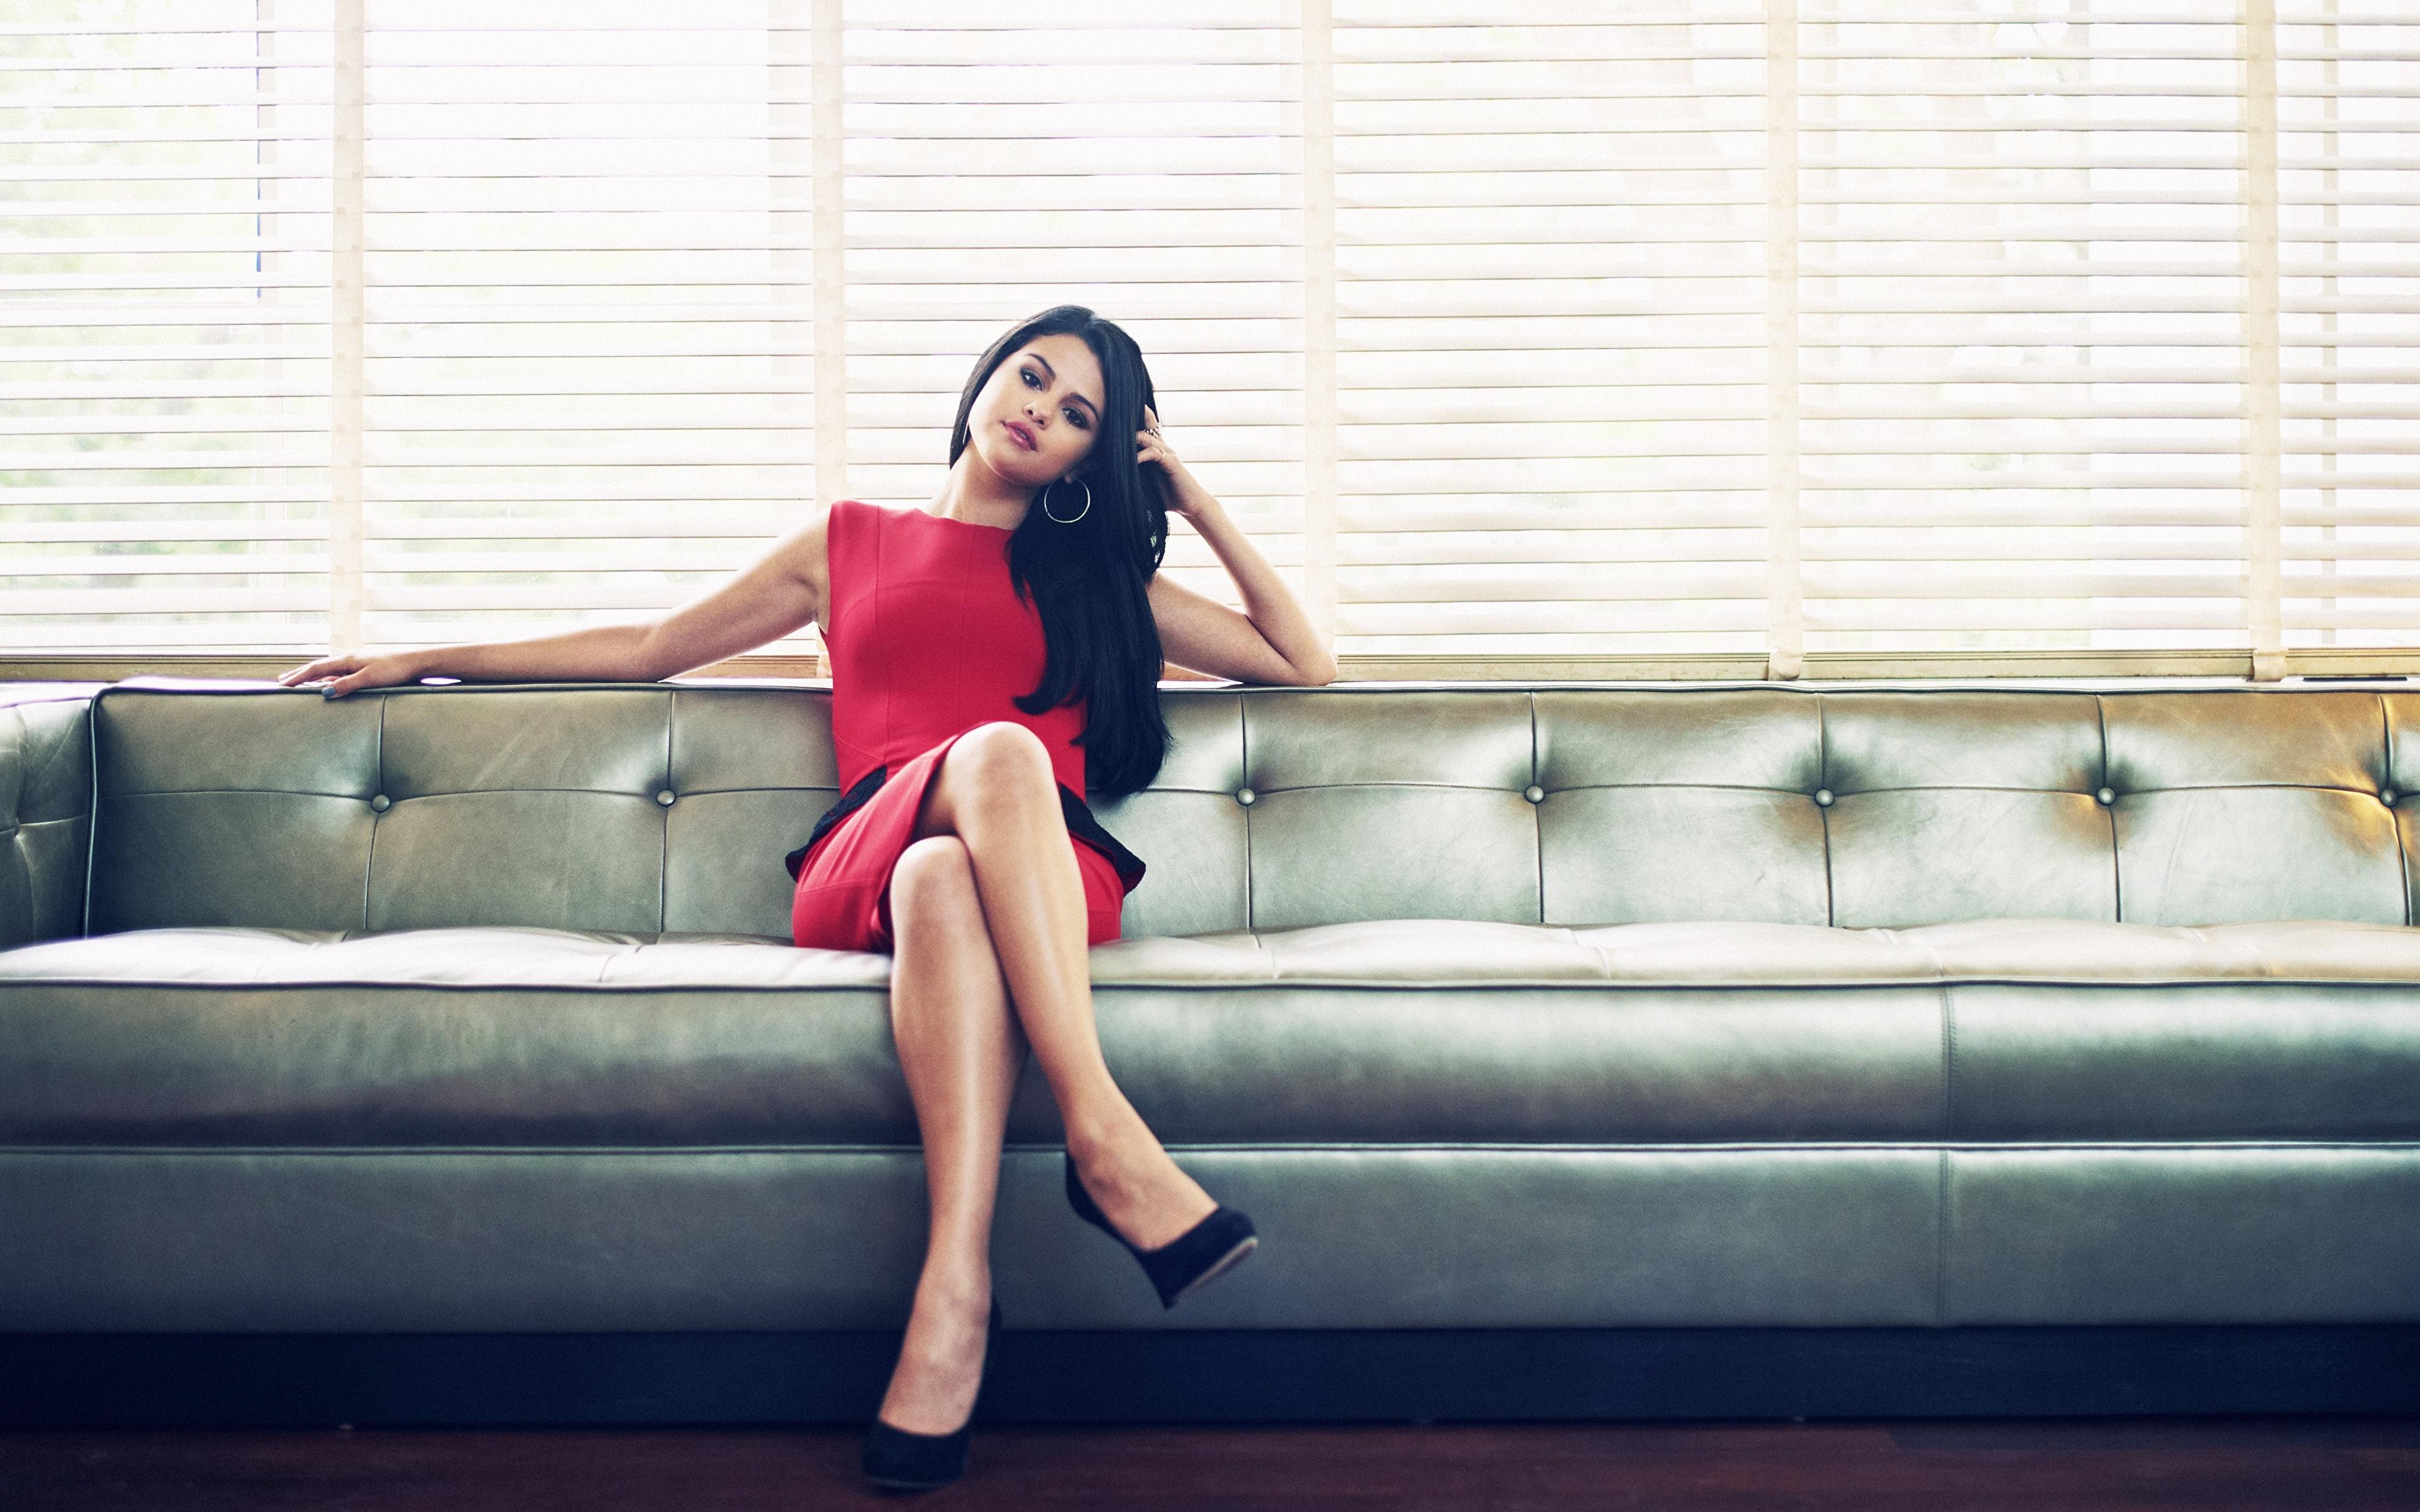 Девушка брюнетка на диване  № 651810 бесплатно